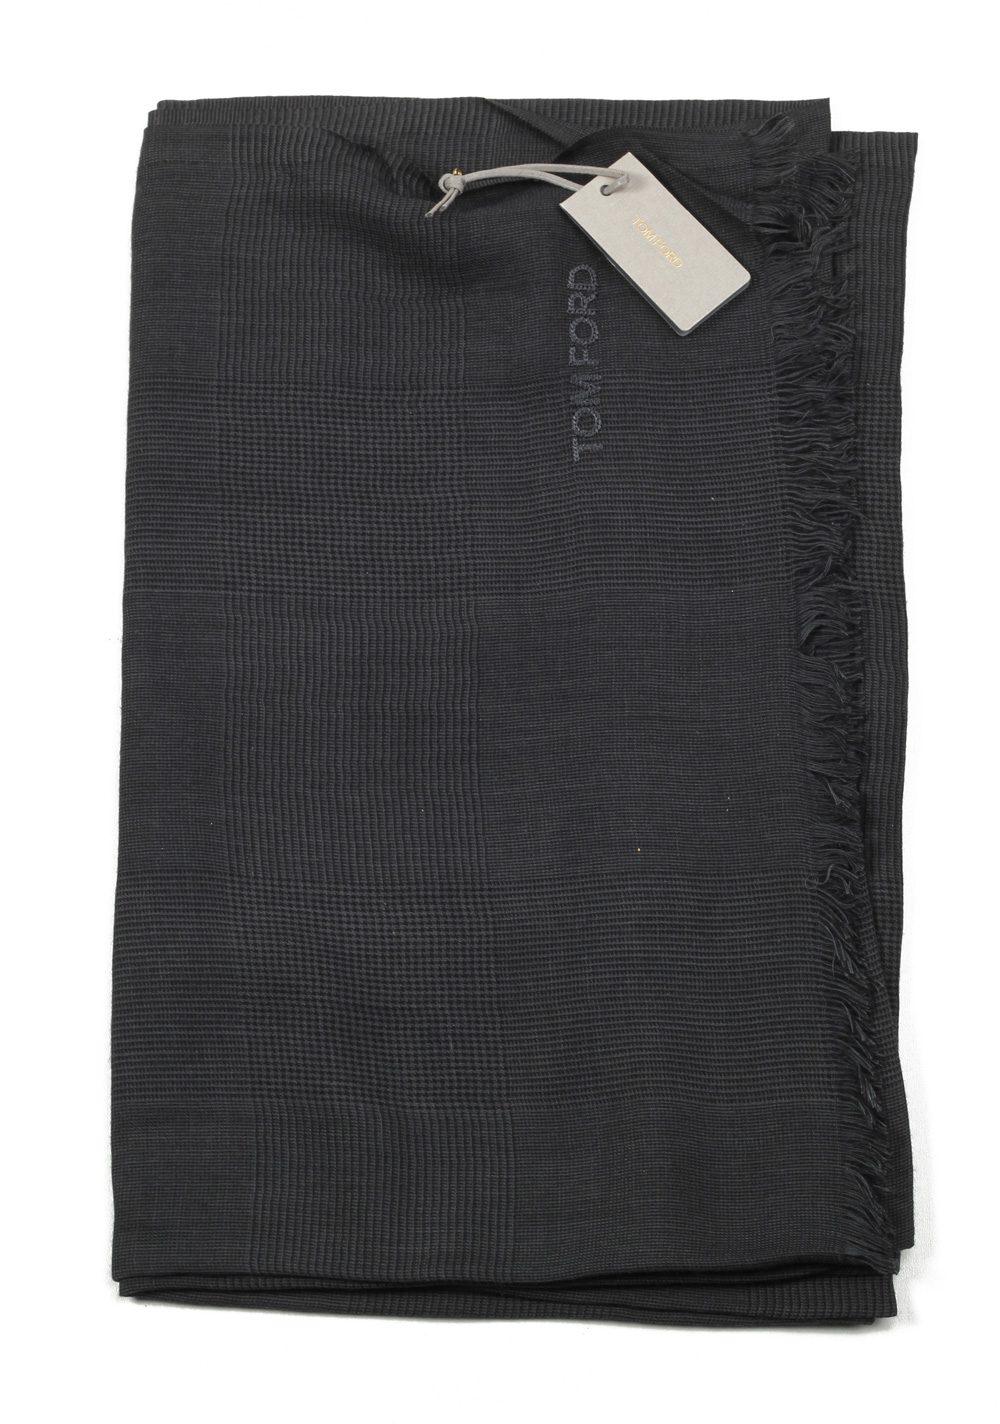 Tom Ford Gray Modal Cashmere Silk Signature Scarf 75″ / 30″ | Costume Limité